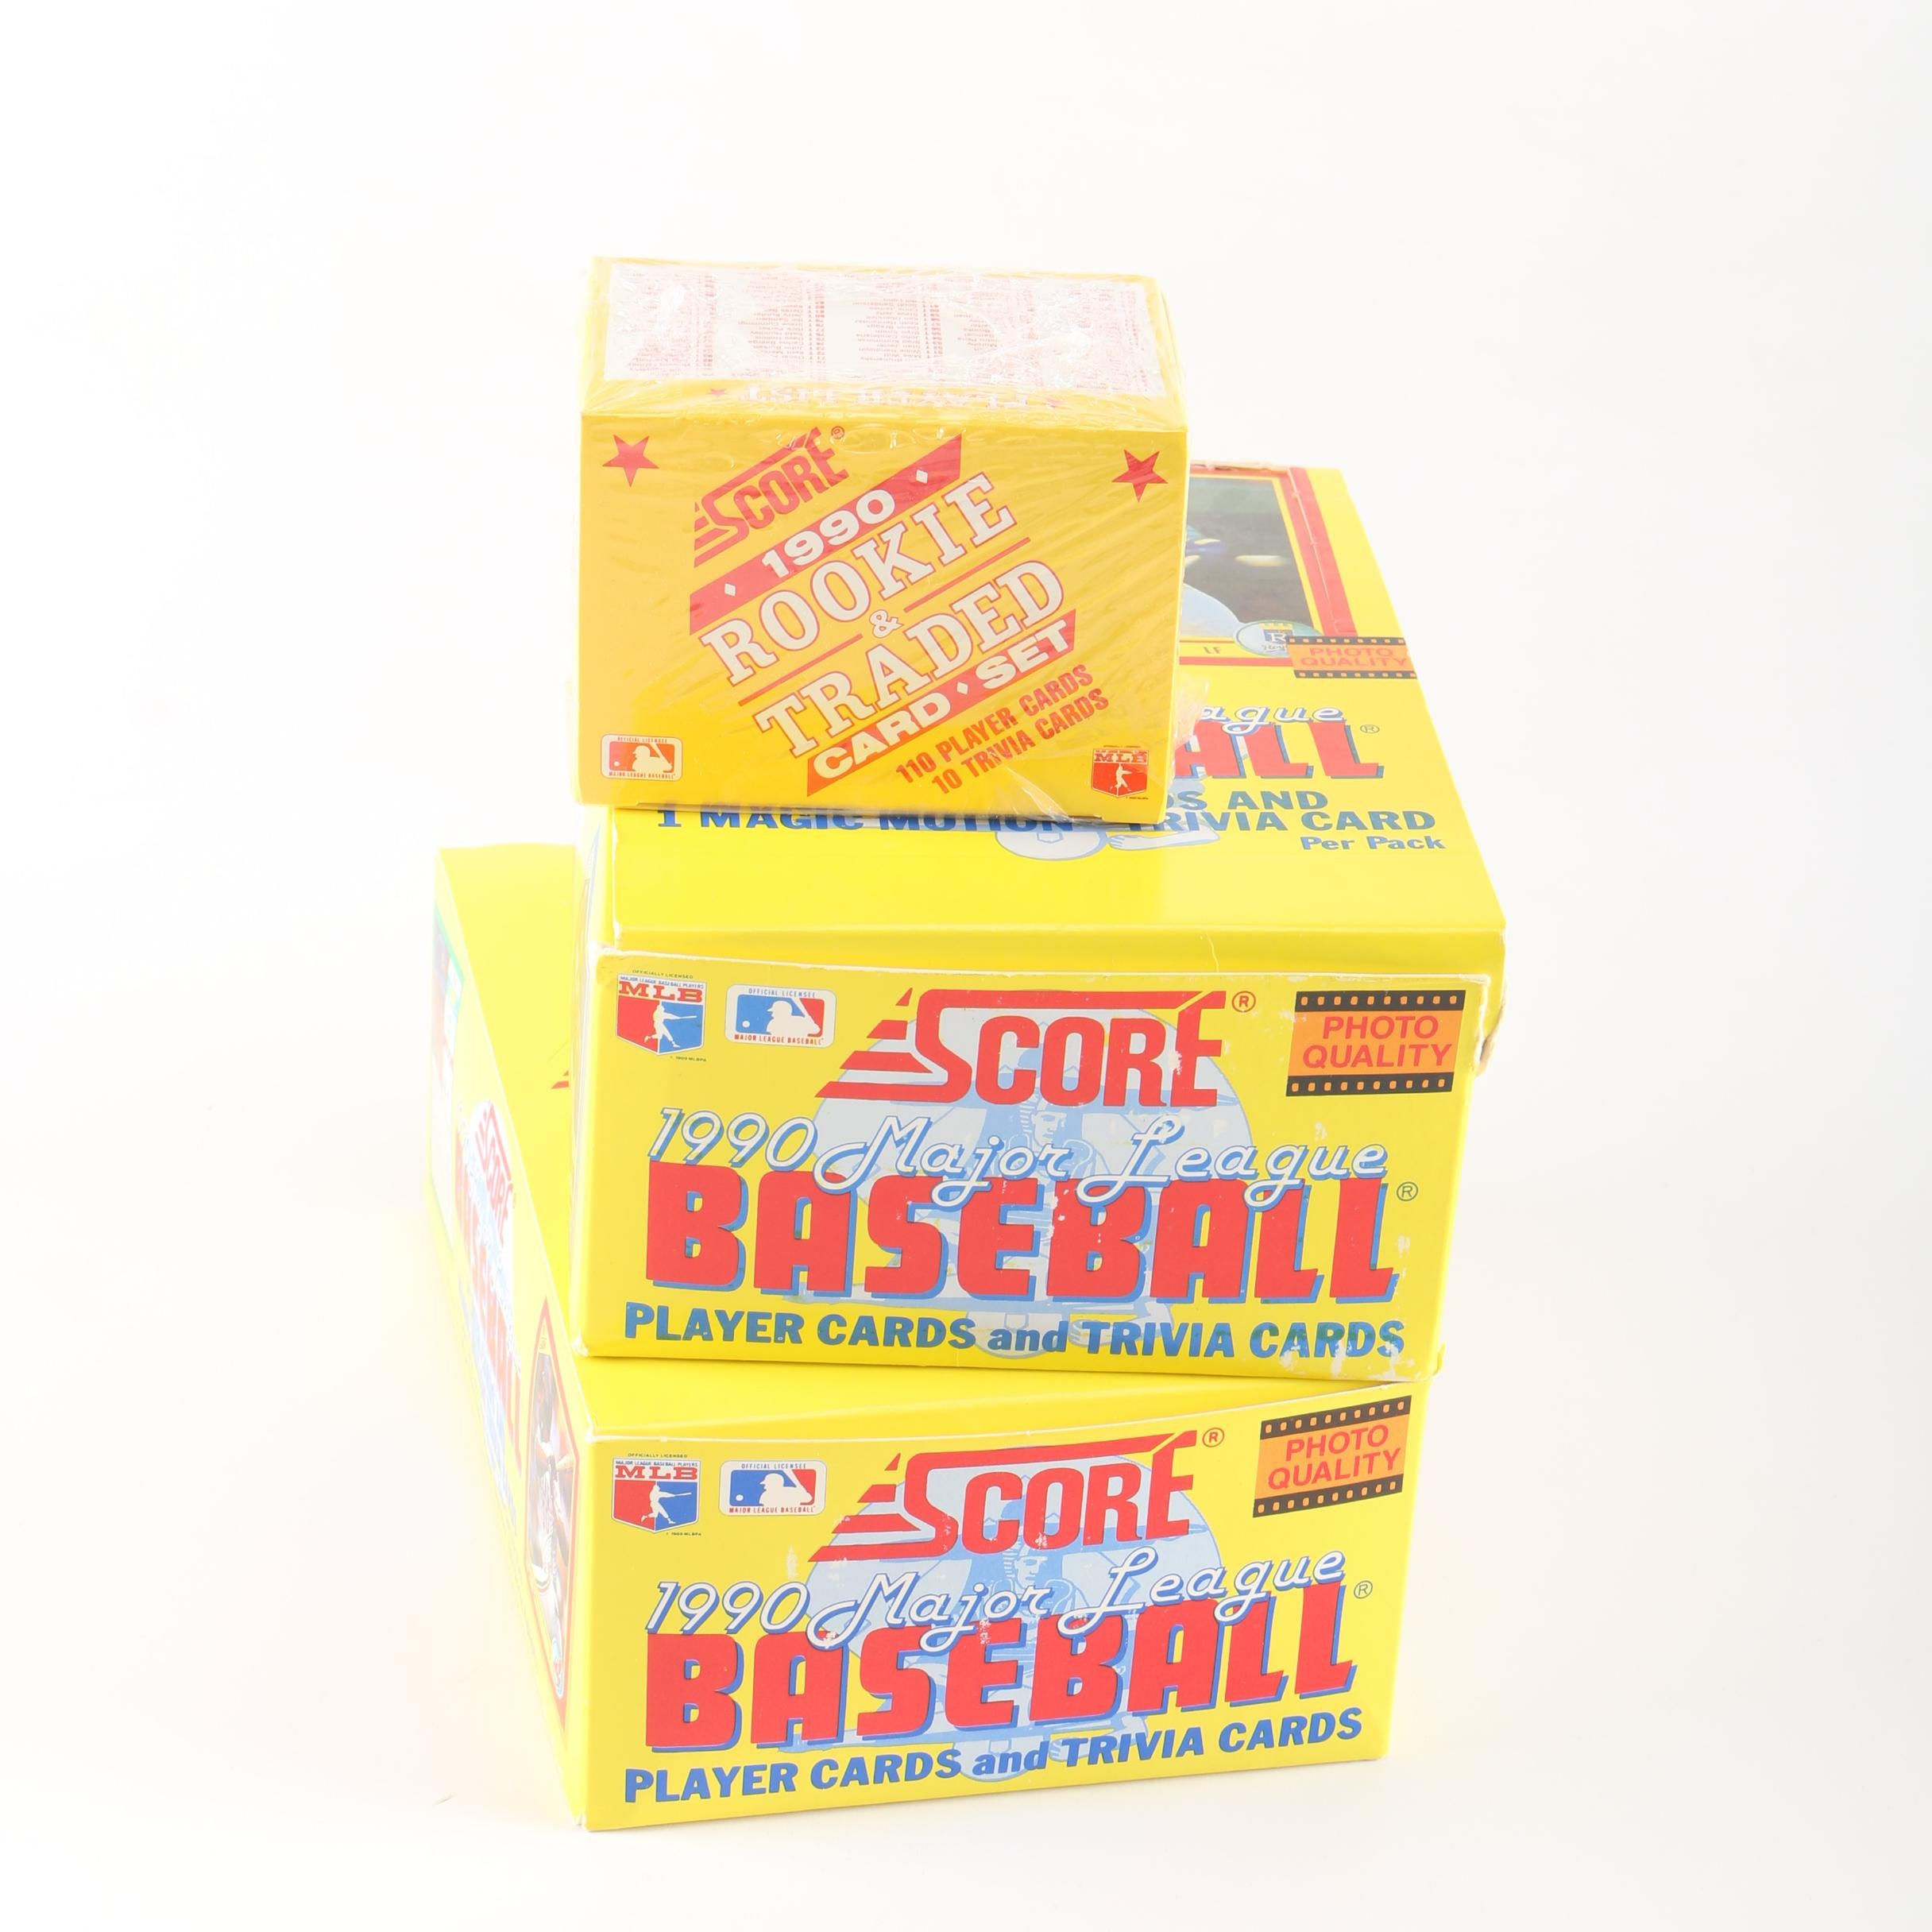 1990 Score Baseball Card Boxes and Set